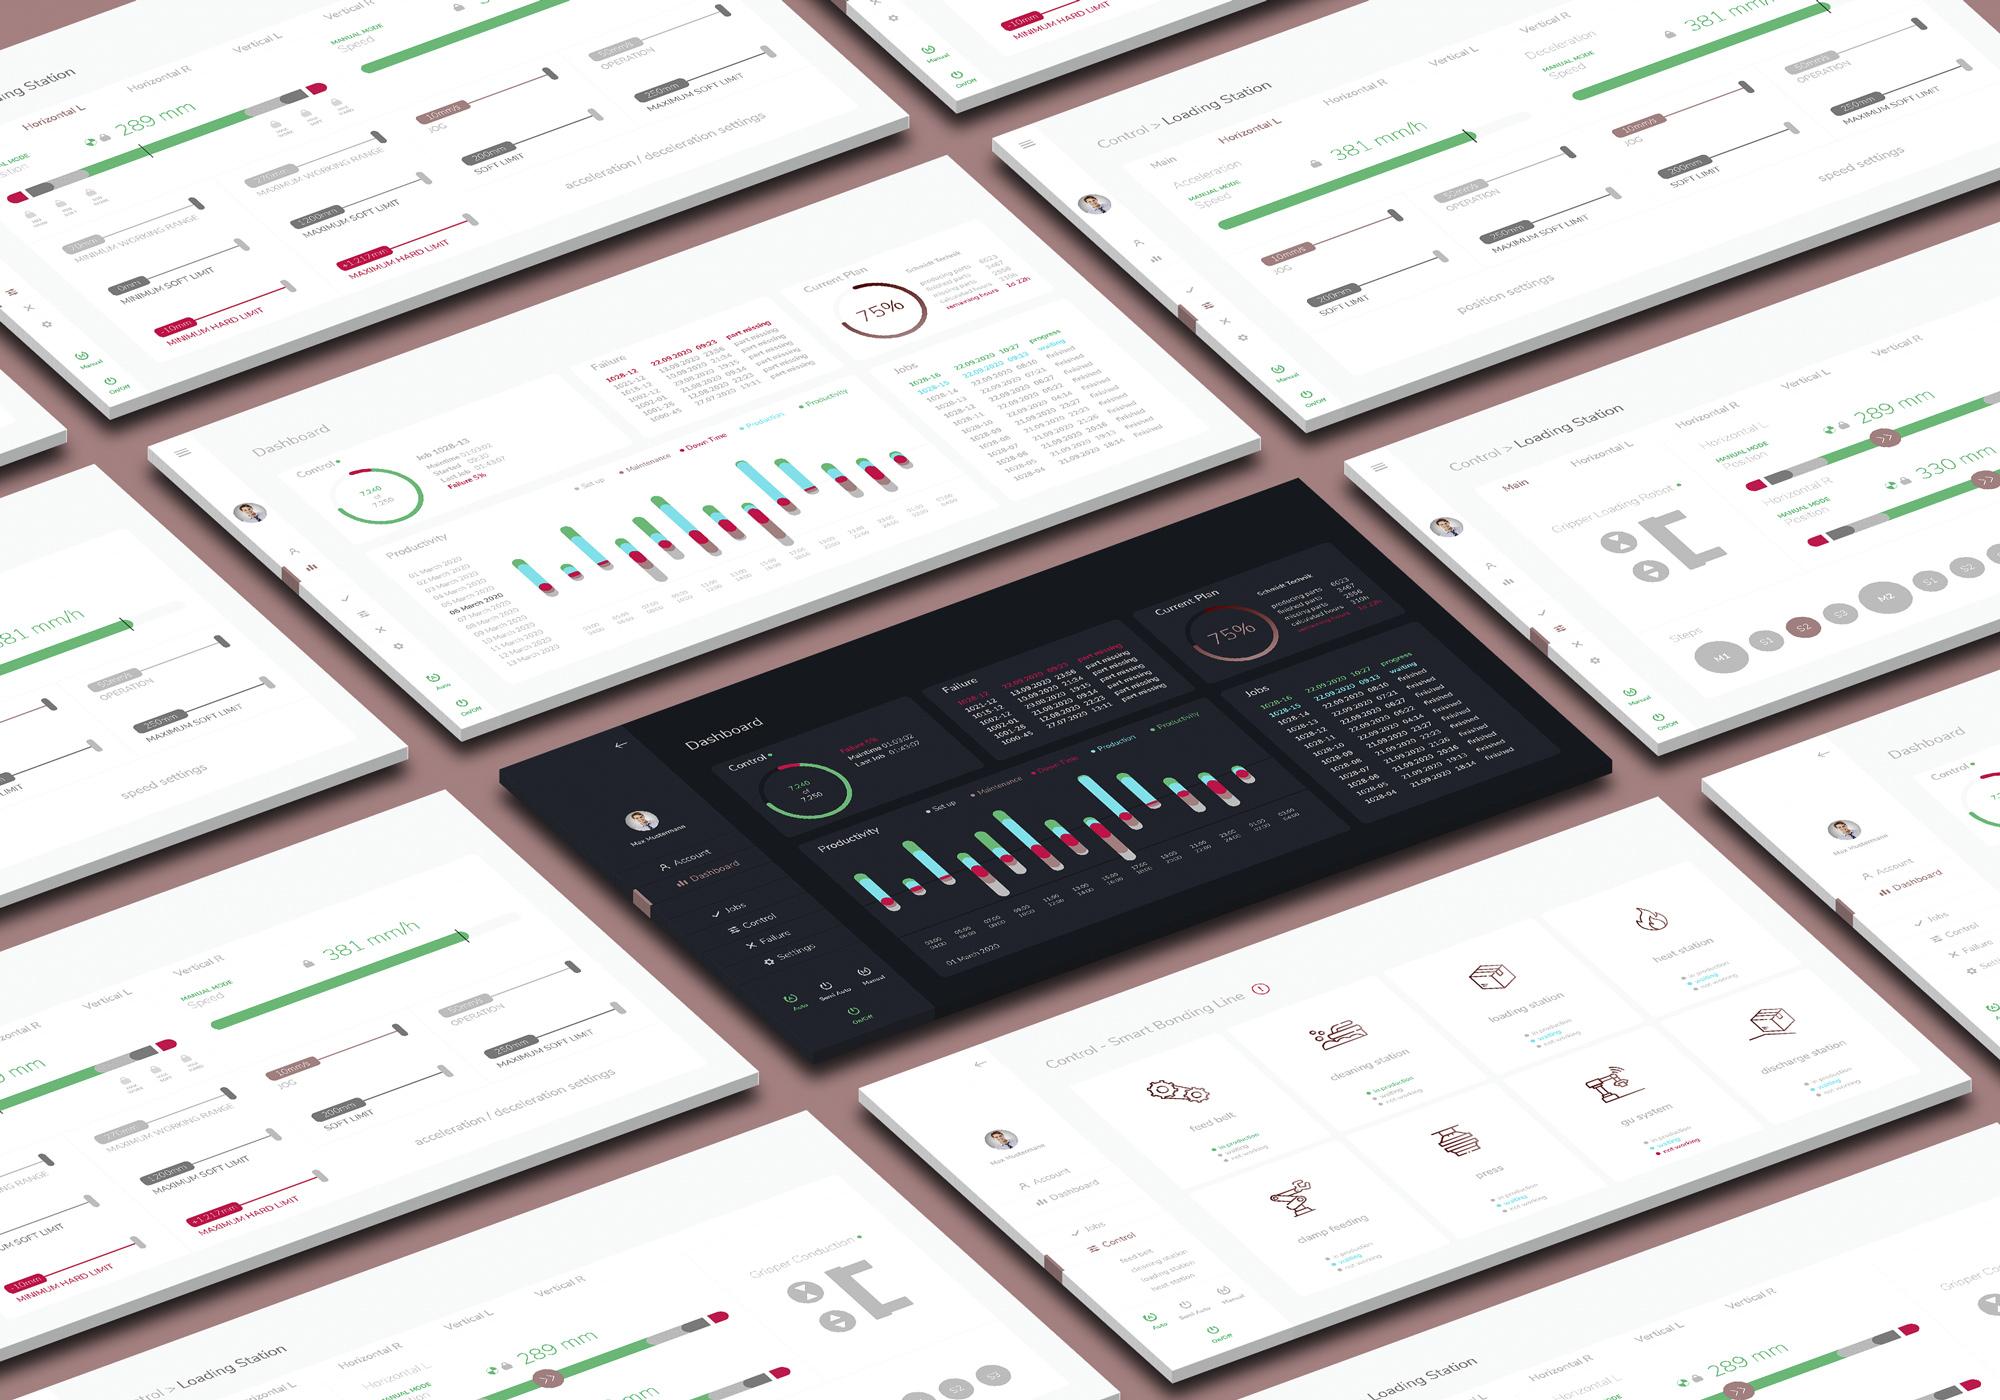 kopfmedia-hmi-user-interface-ui-software